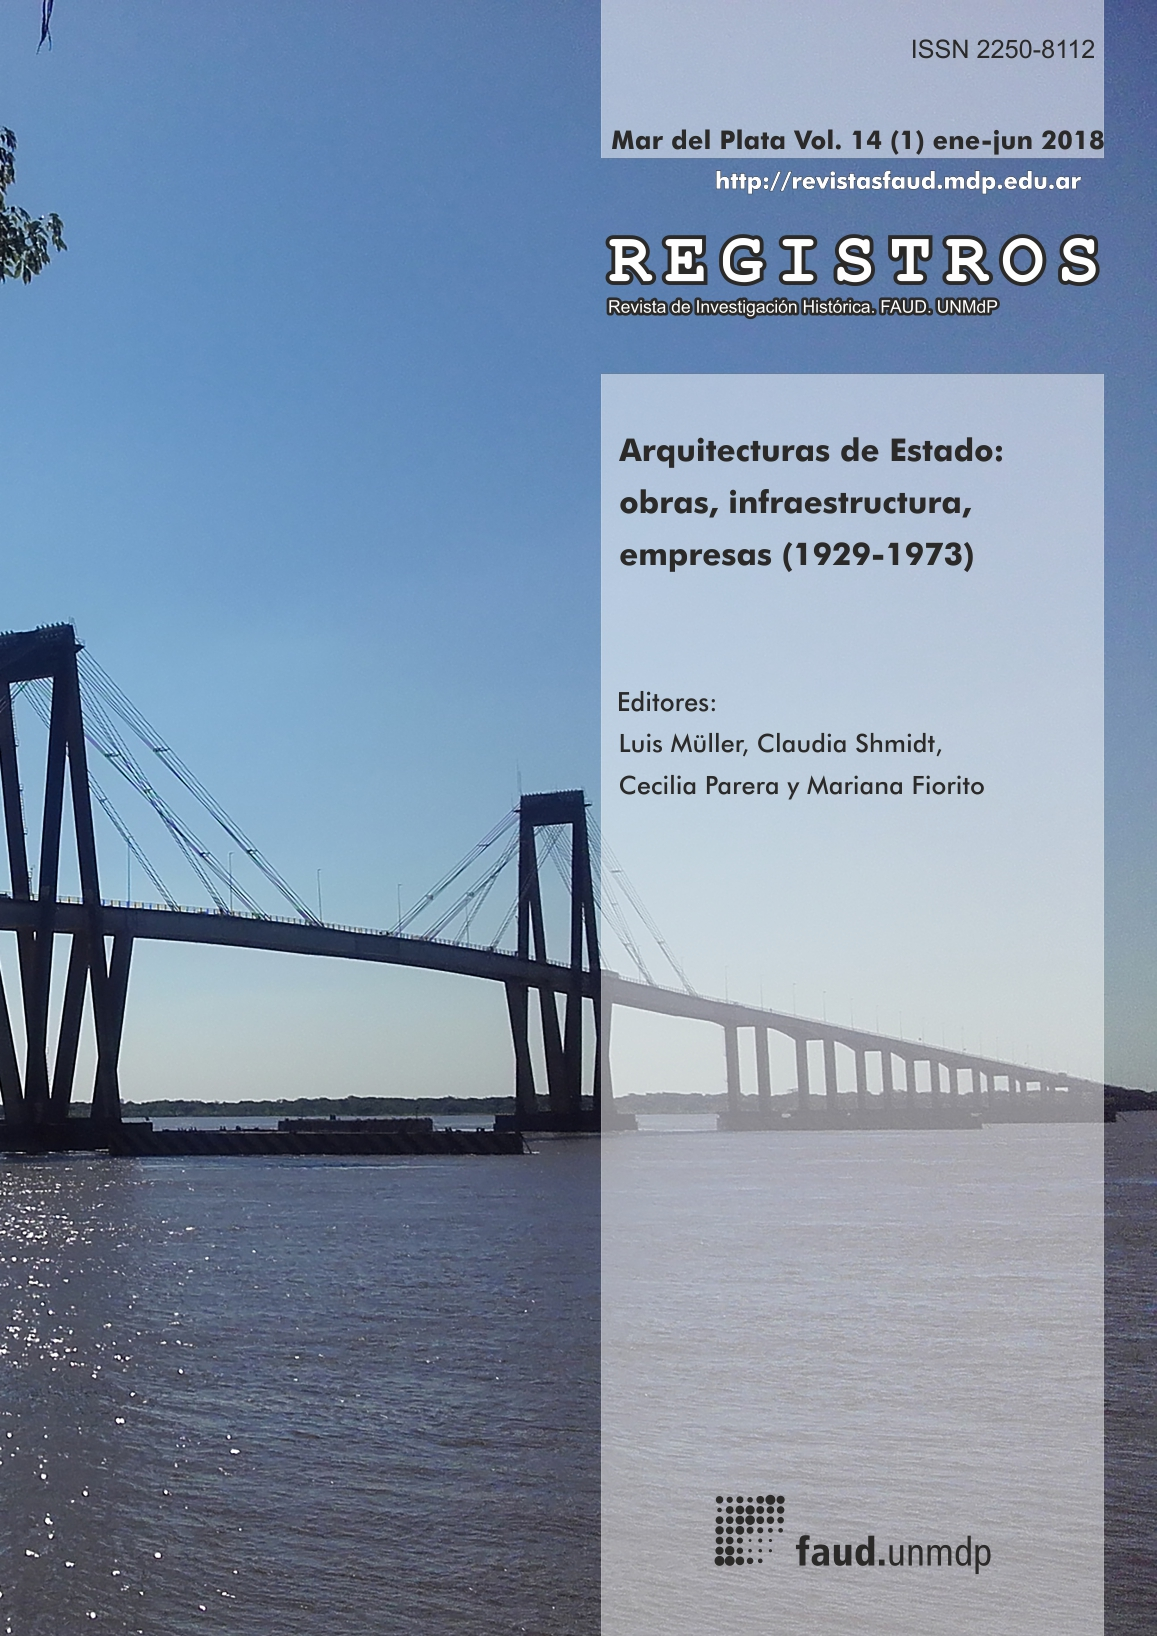 Ver Vol. 14 Núm. 1 (2018): Arquitecturas de Estado: obras, infraestructura, empresas (1929-1973)